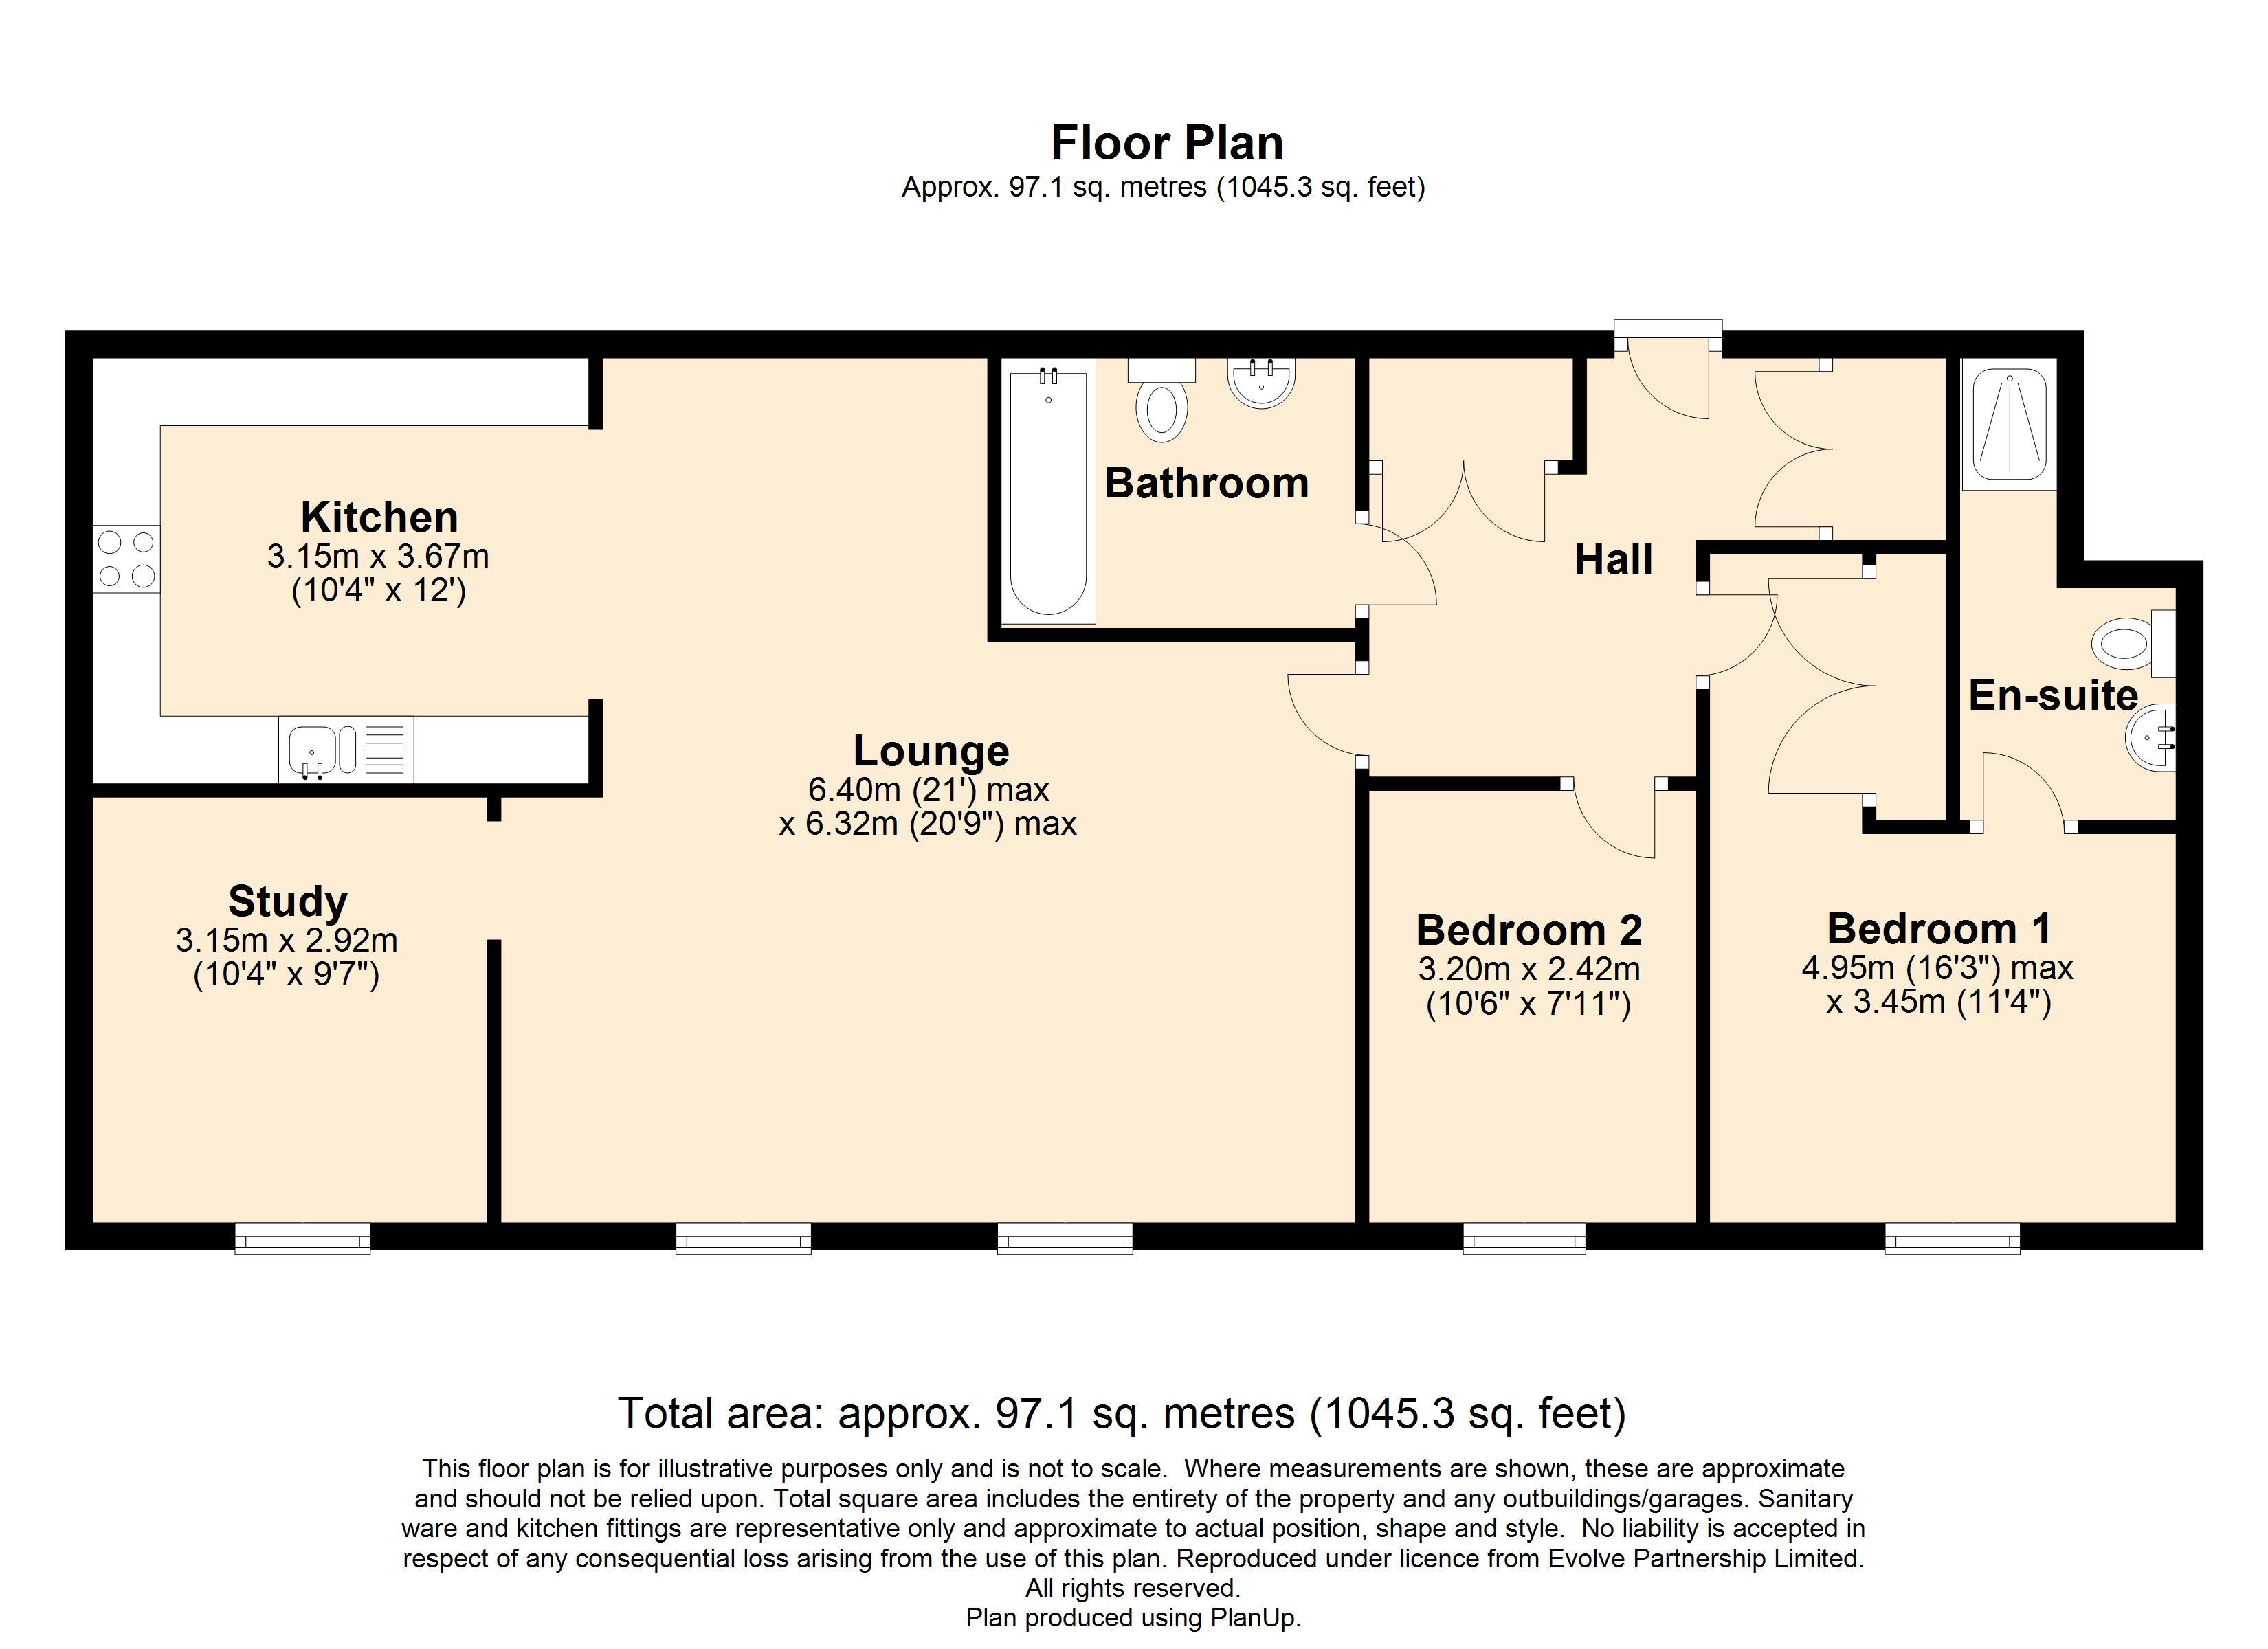 31 Farmery Court Floorplan